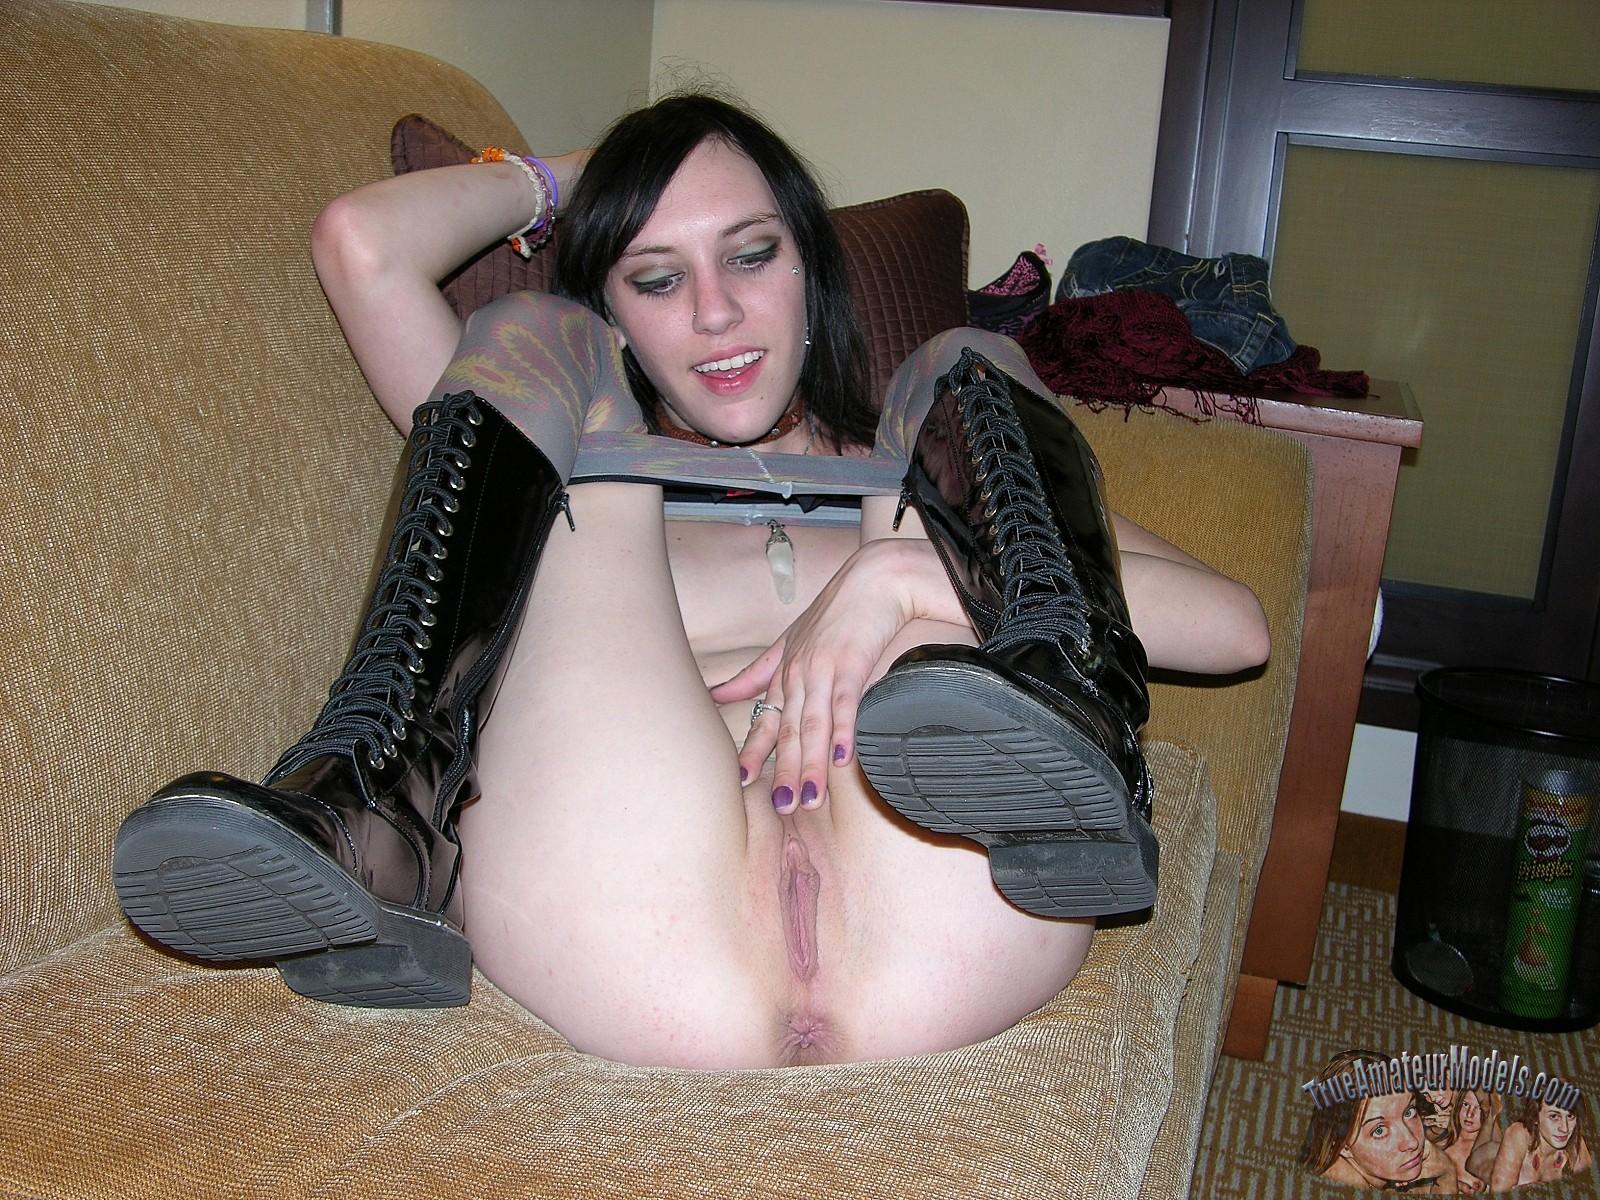 Zoe saldana nude sex scene